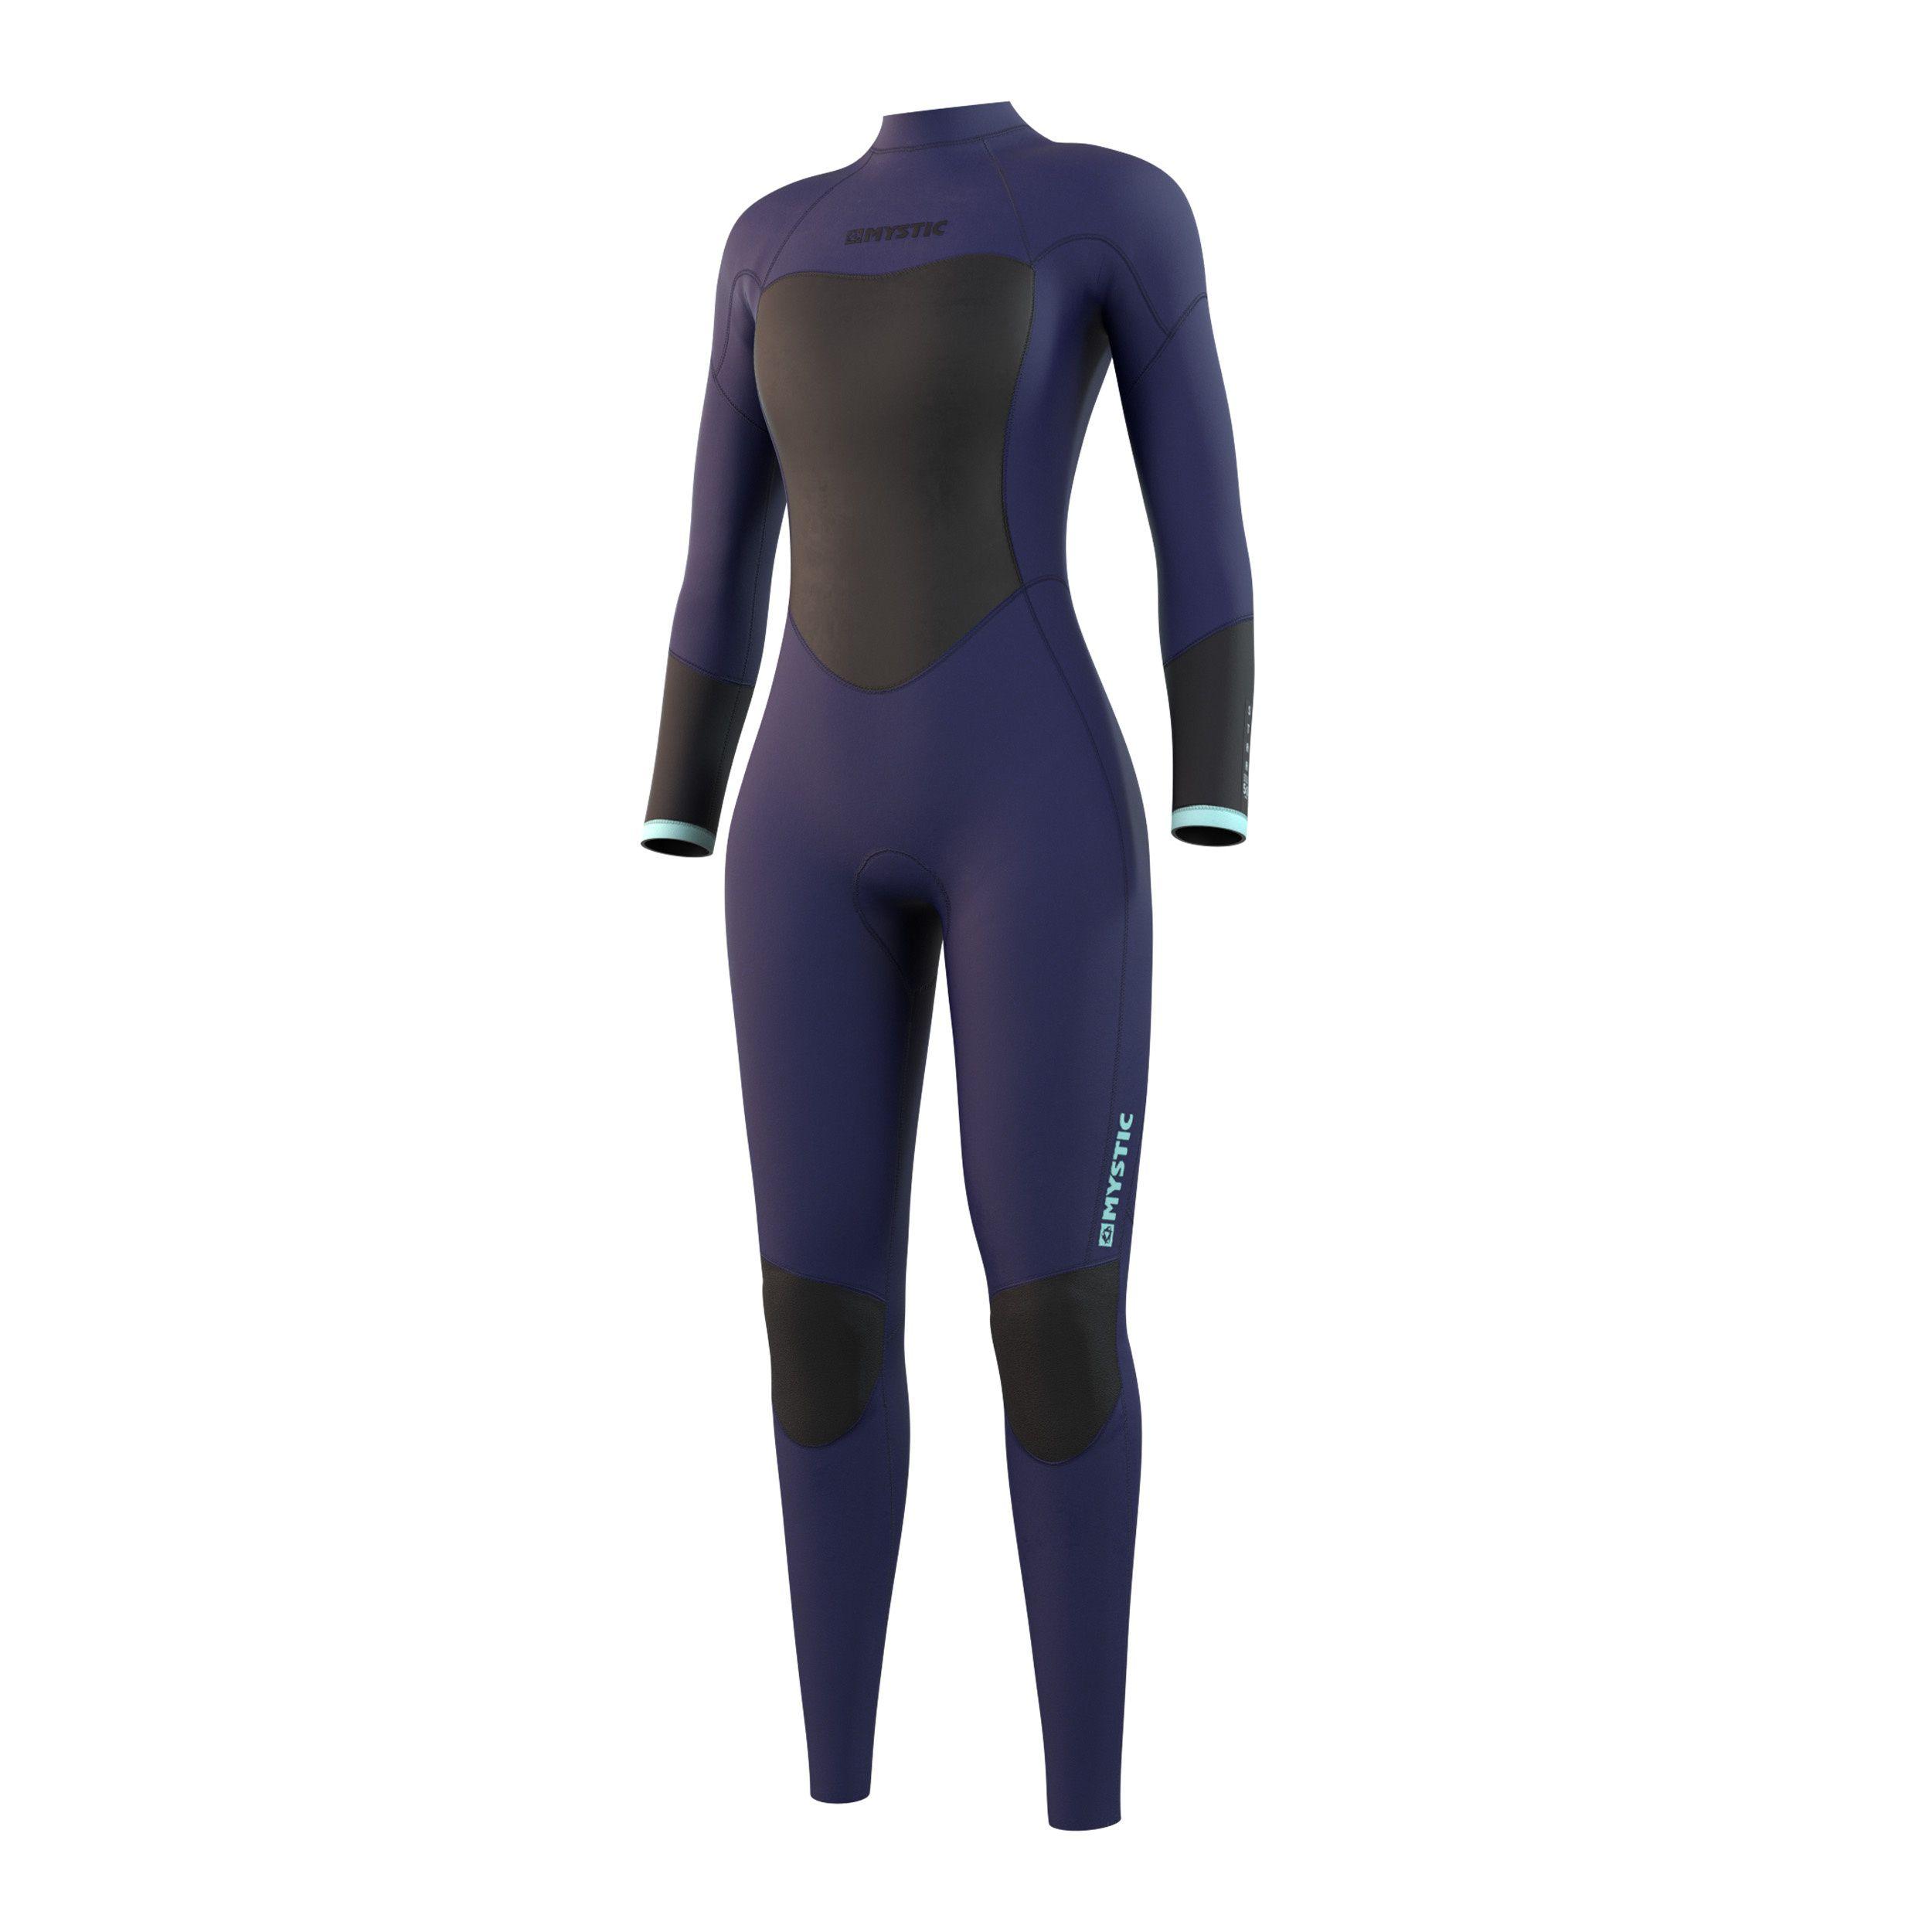 Mystic dames wetsuit Star 5/4